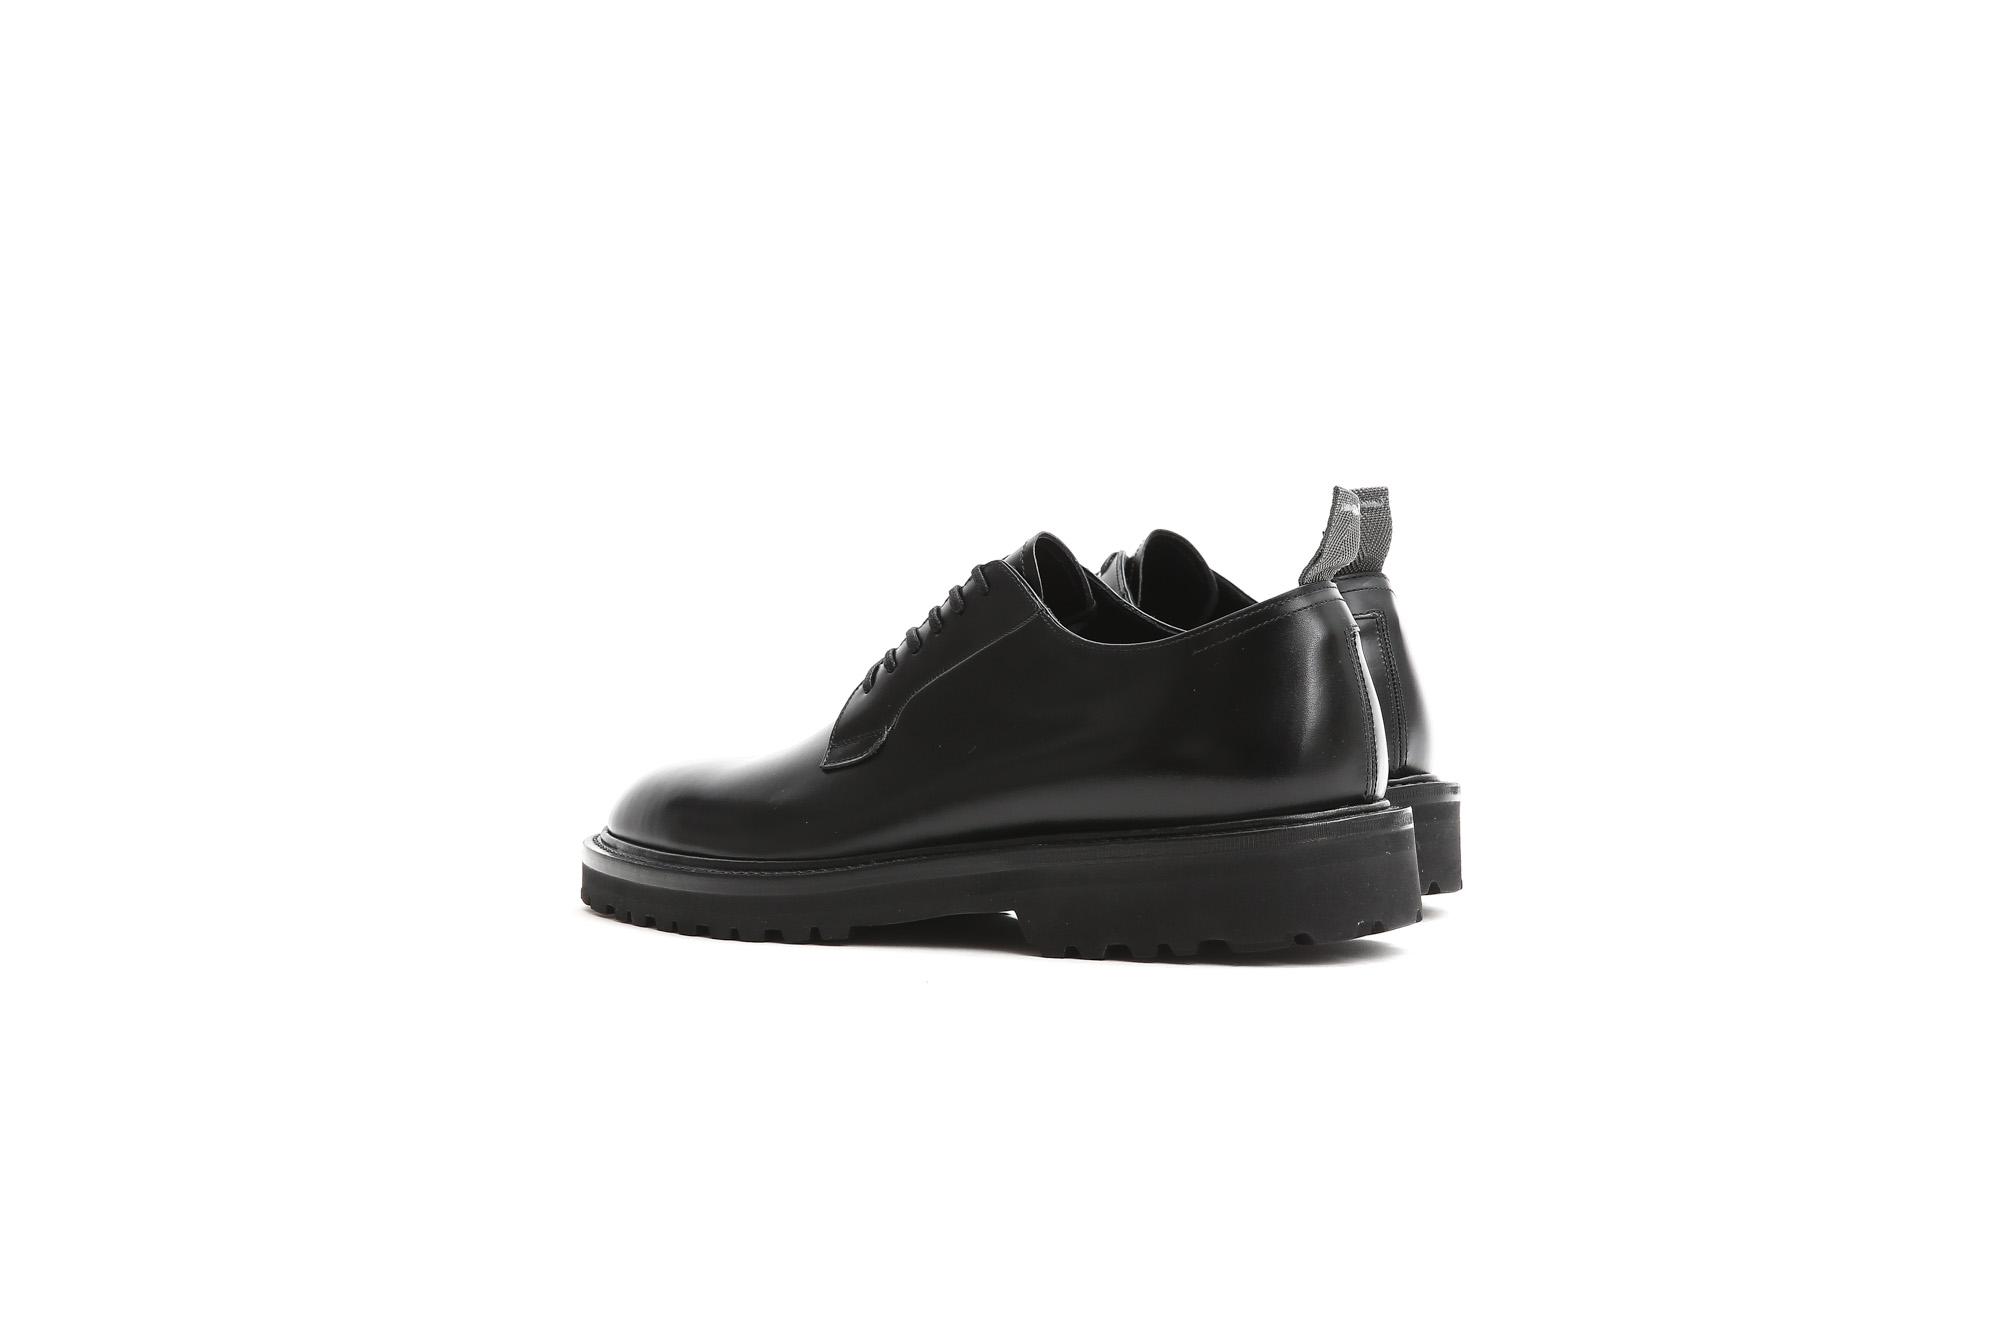 【WH / ダブルエイチ】 【WH-0001(WHS-0001)】 Plane Toe Shoes (干場氏 スペシャル モデル) Cruise Last (クルーズラスト) ANNONAY Vocalou Calf Leather プレーントゥシューズ BLACK (ブラック) MADE IN JAPAN(日本製) 2018 春夏新作   【干場氏、坪内氏の直筆サイン入り】【ZODIAC限定 スペシャルアイテム】 wh 干場さん 干場スペシャル FORZASTYLE フォルザスタイル 愛知 名古屋 ZODIAC ゾディアック